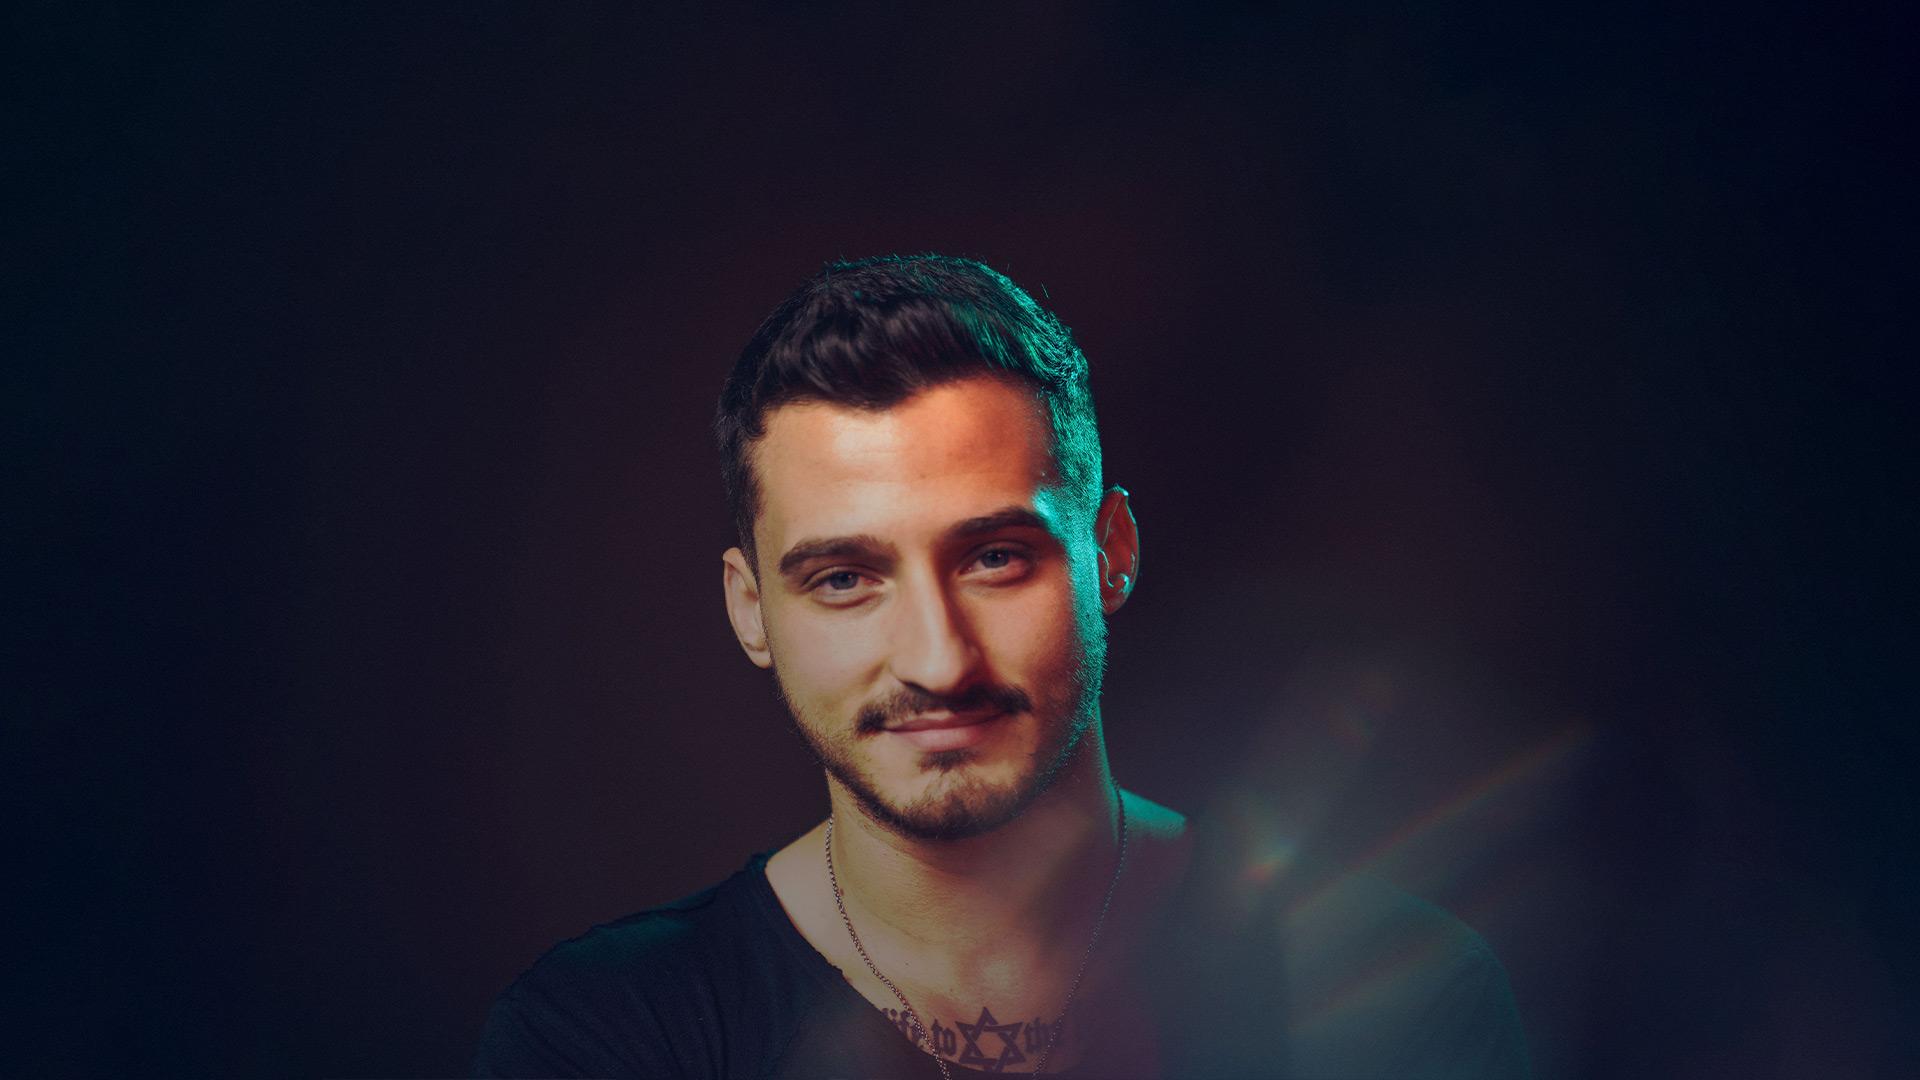 Interviu cu influenceri: Radu Constantin